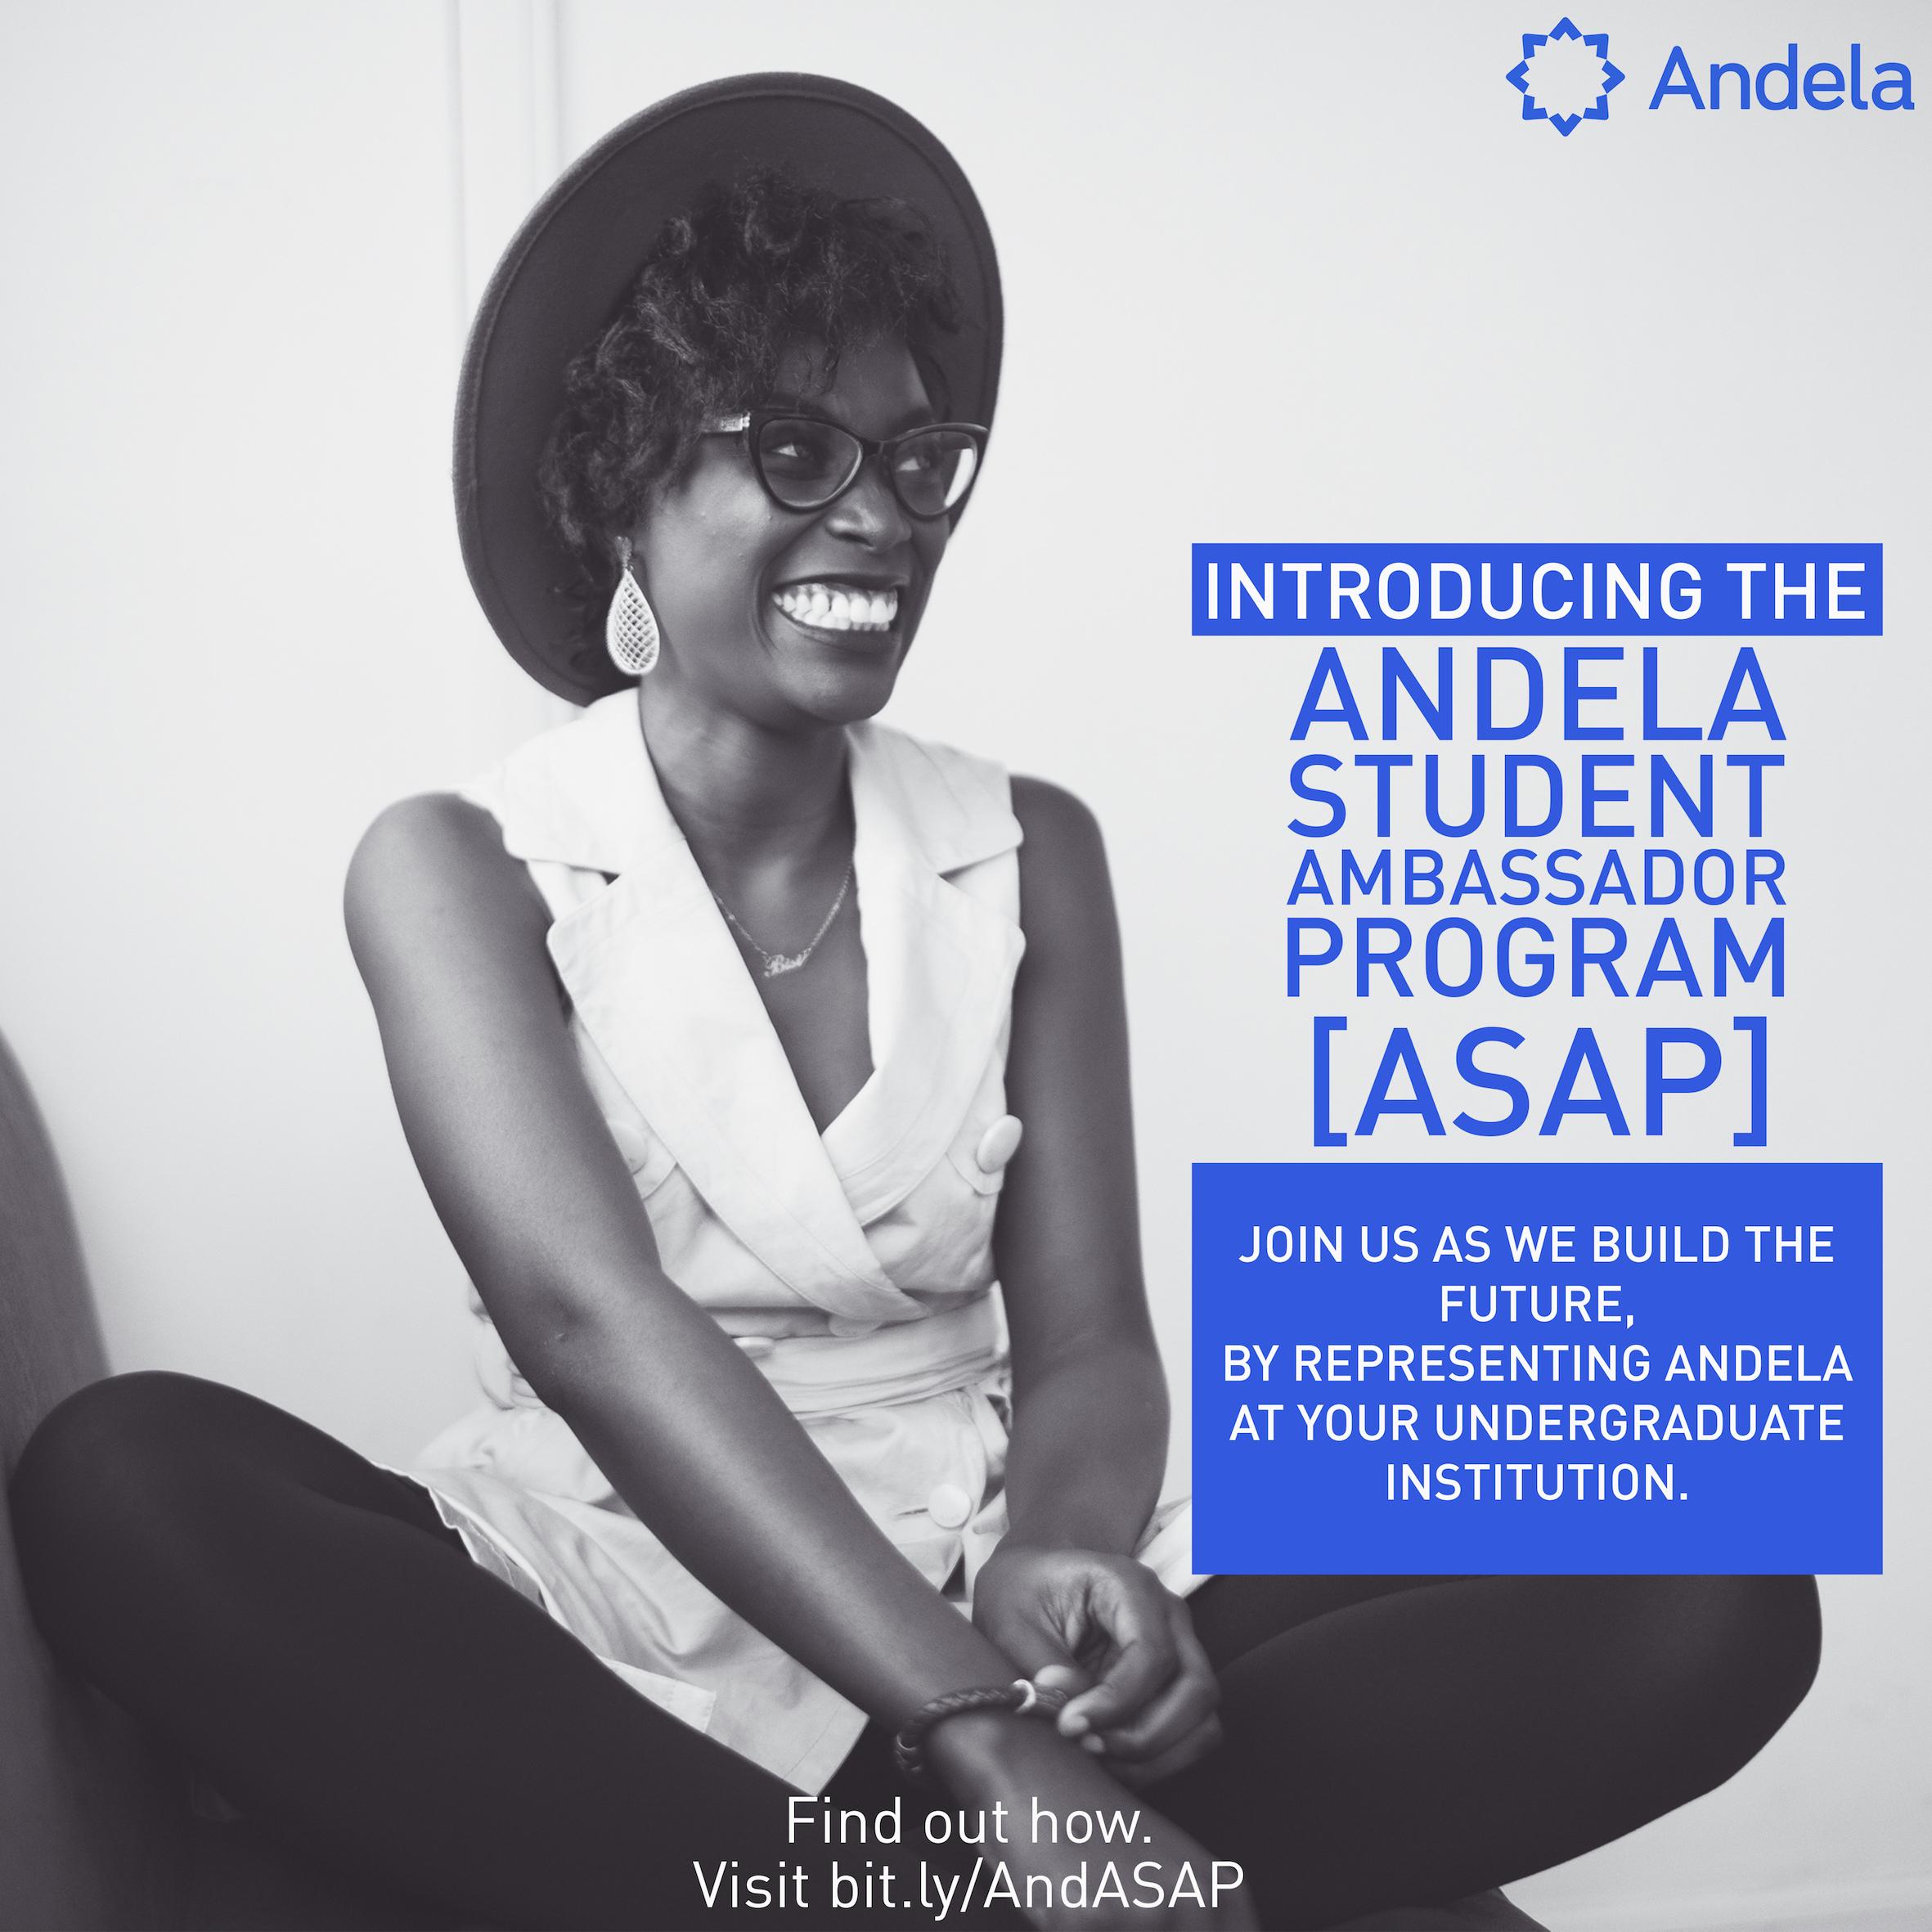 Andela Student Ambassador Program